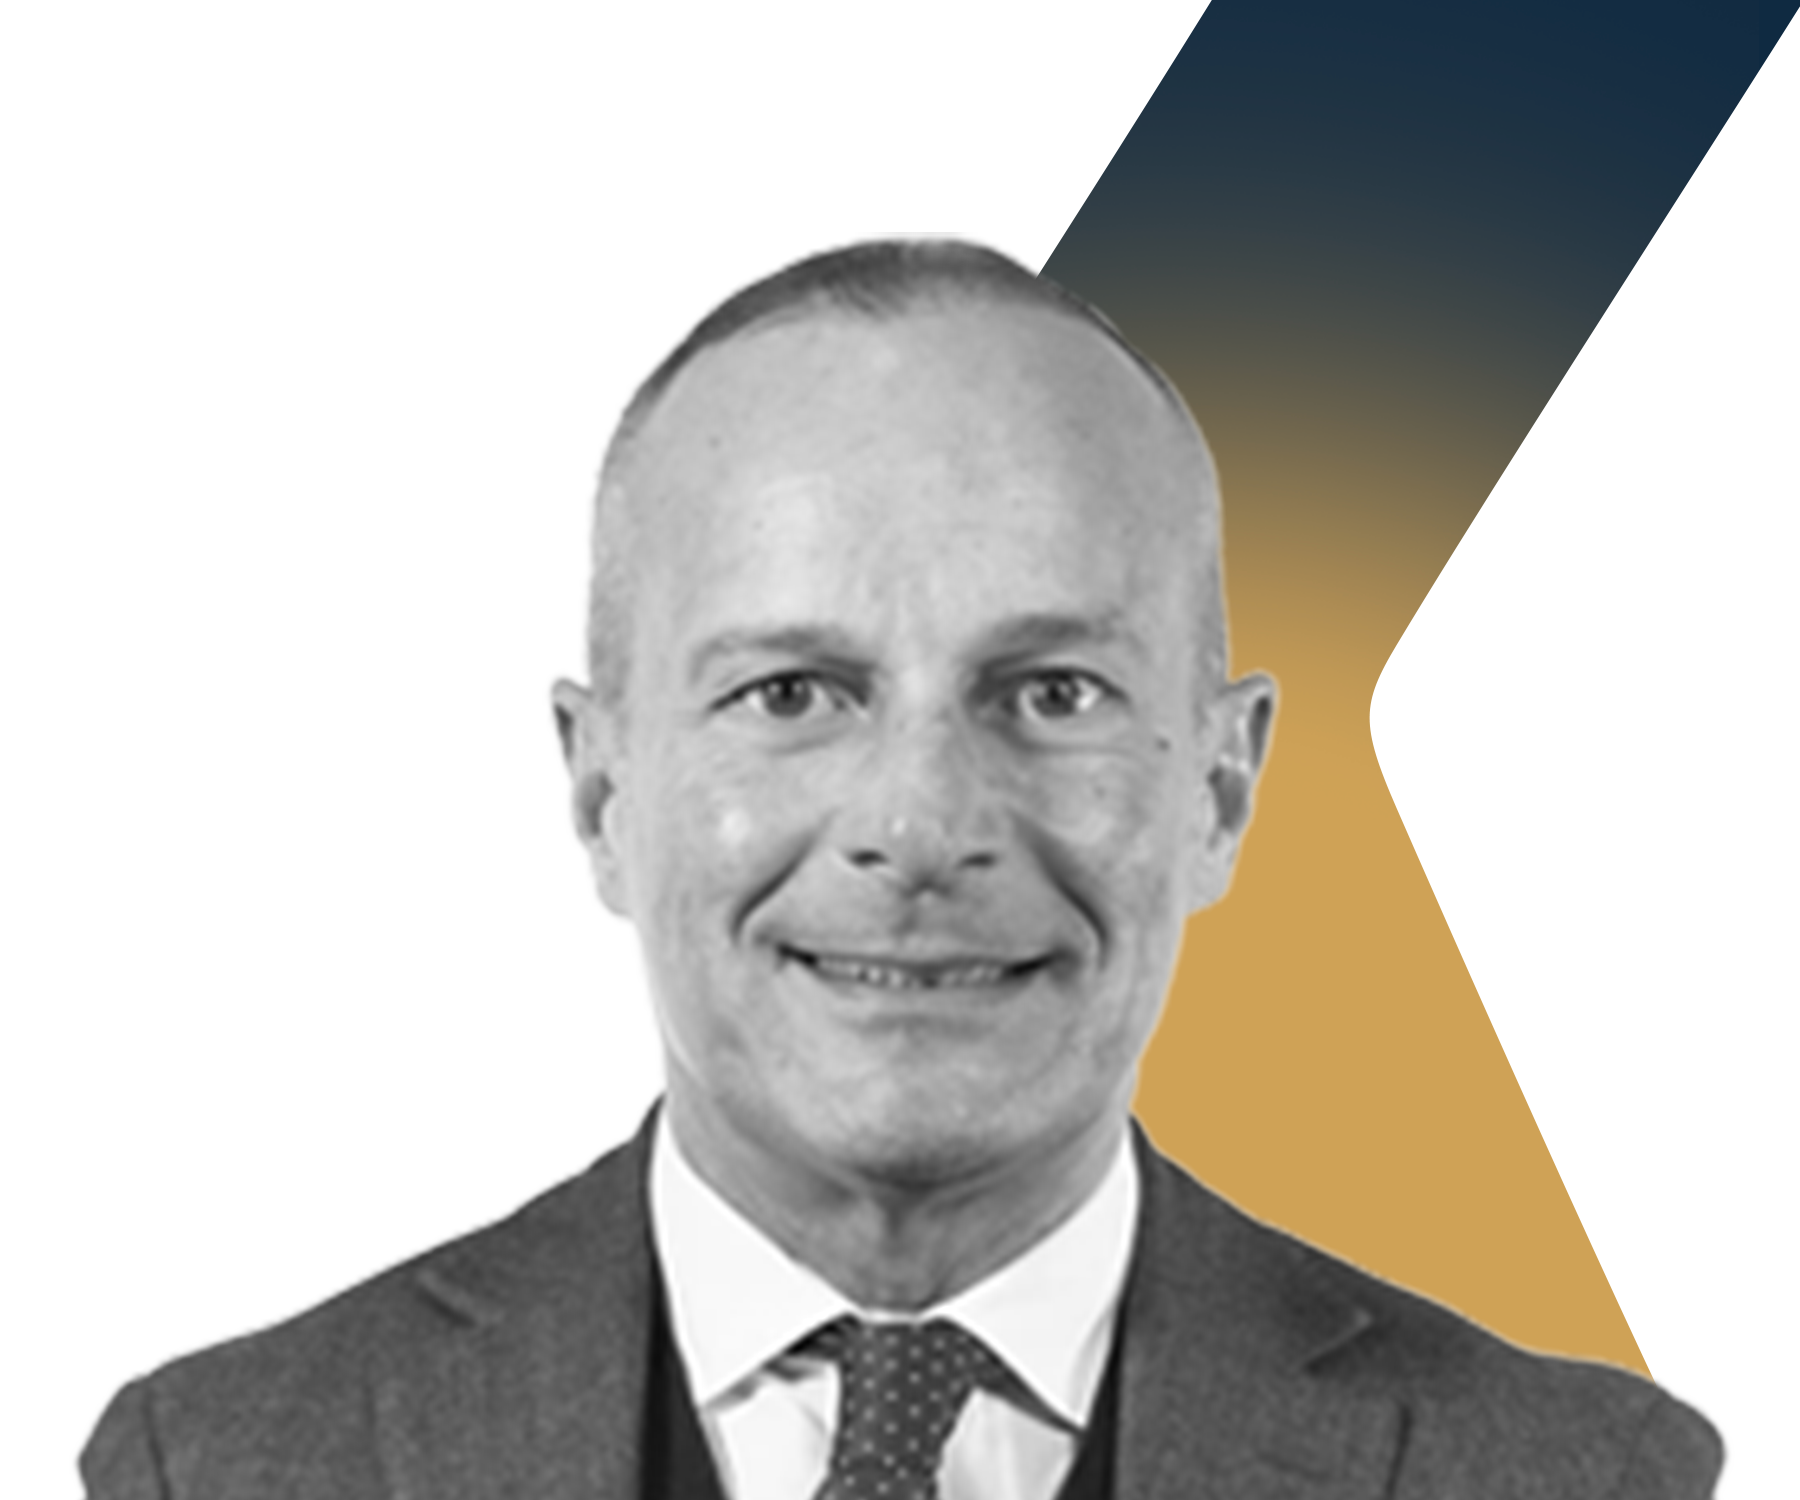 RICCARDO MAZZONI , Chief Credit Officer Pirelli Spa